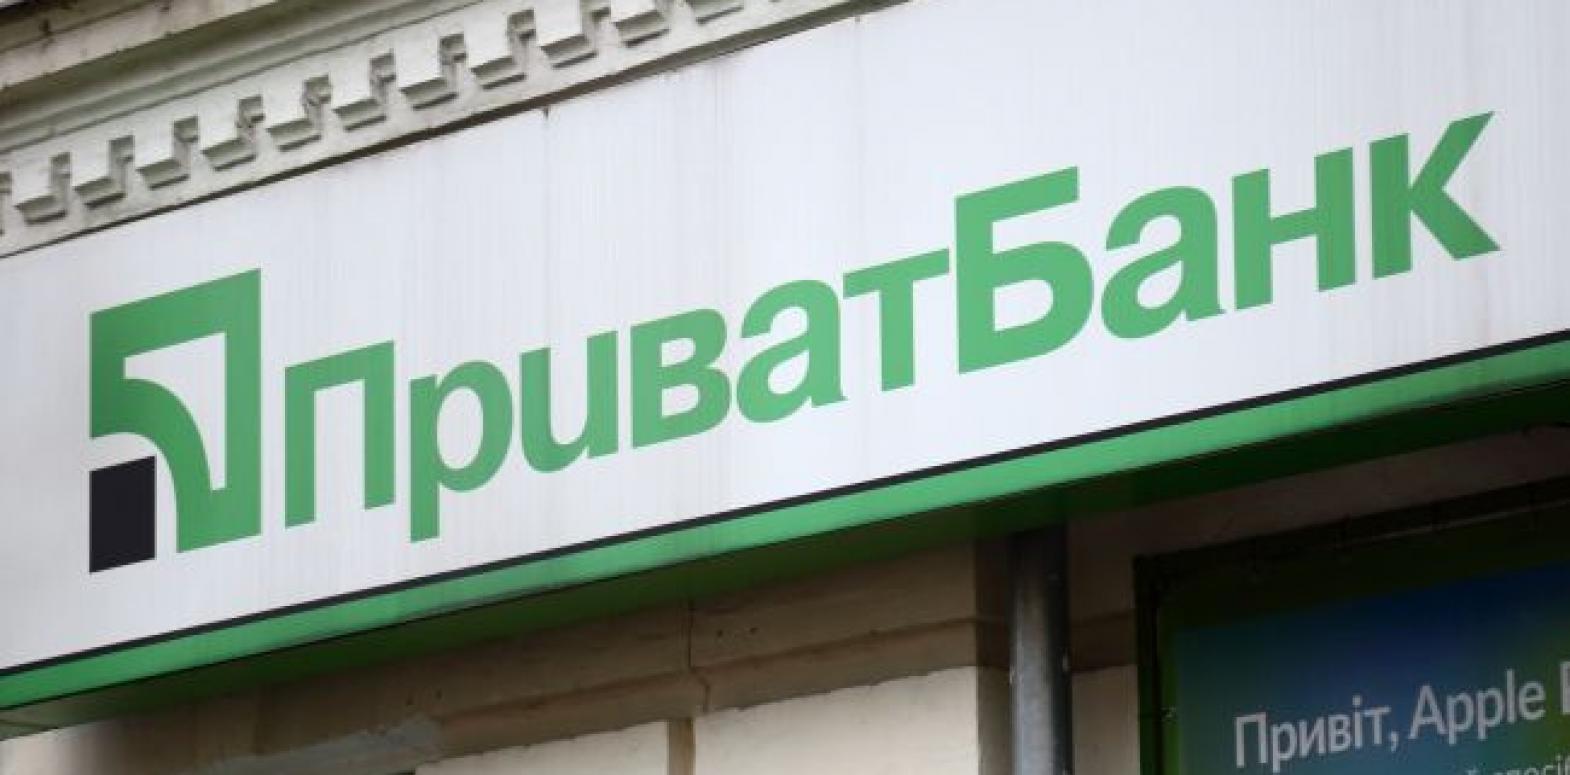 Кабмин назначил трех членов набсовета ПриватБанка